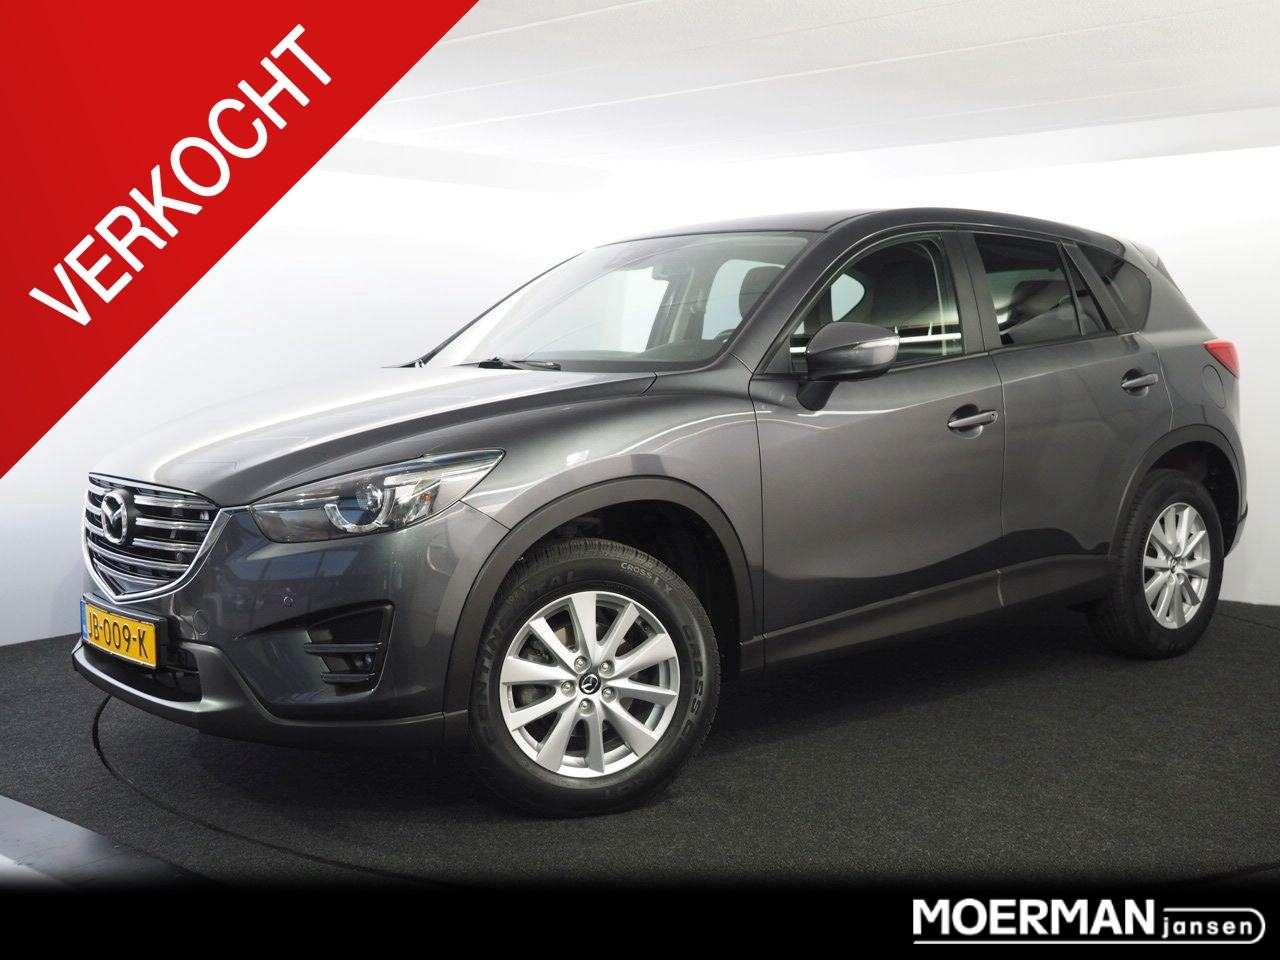 Mazda Cx-5 2.0 skyactiv-g 165 ts+ 2wd verkocht